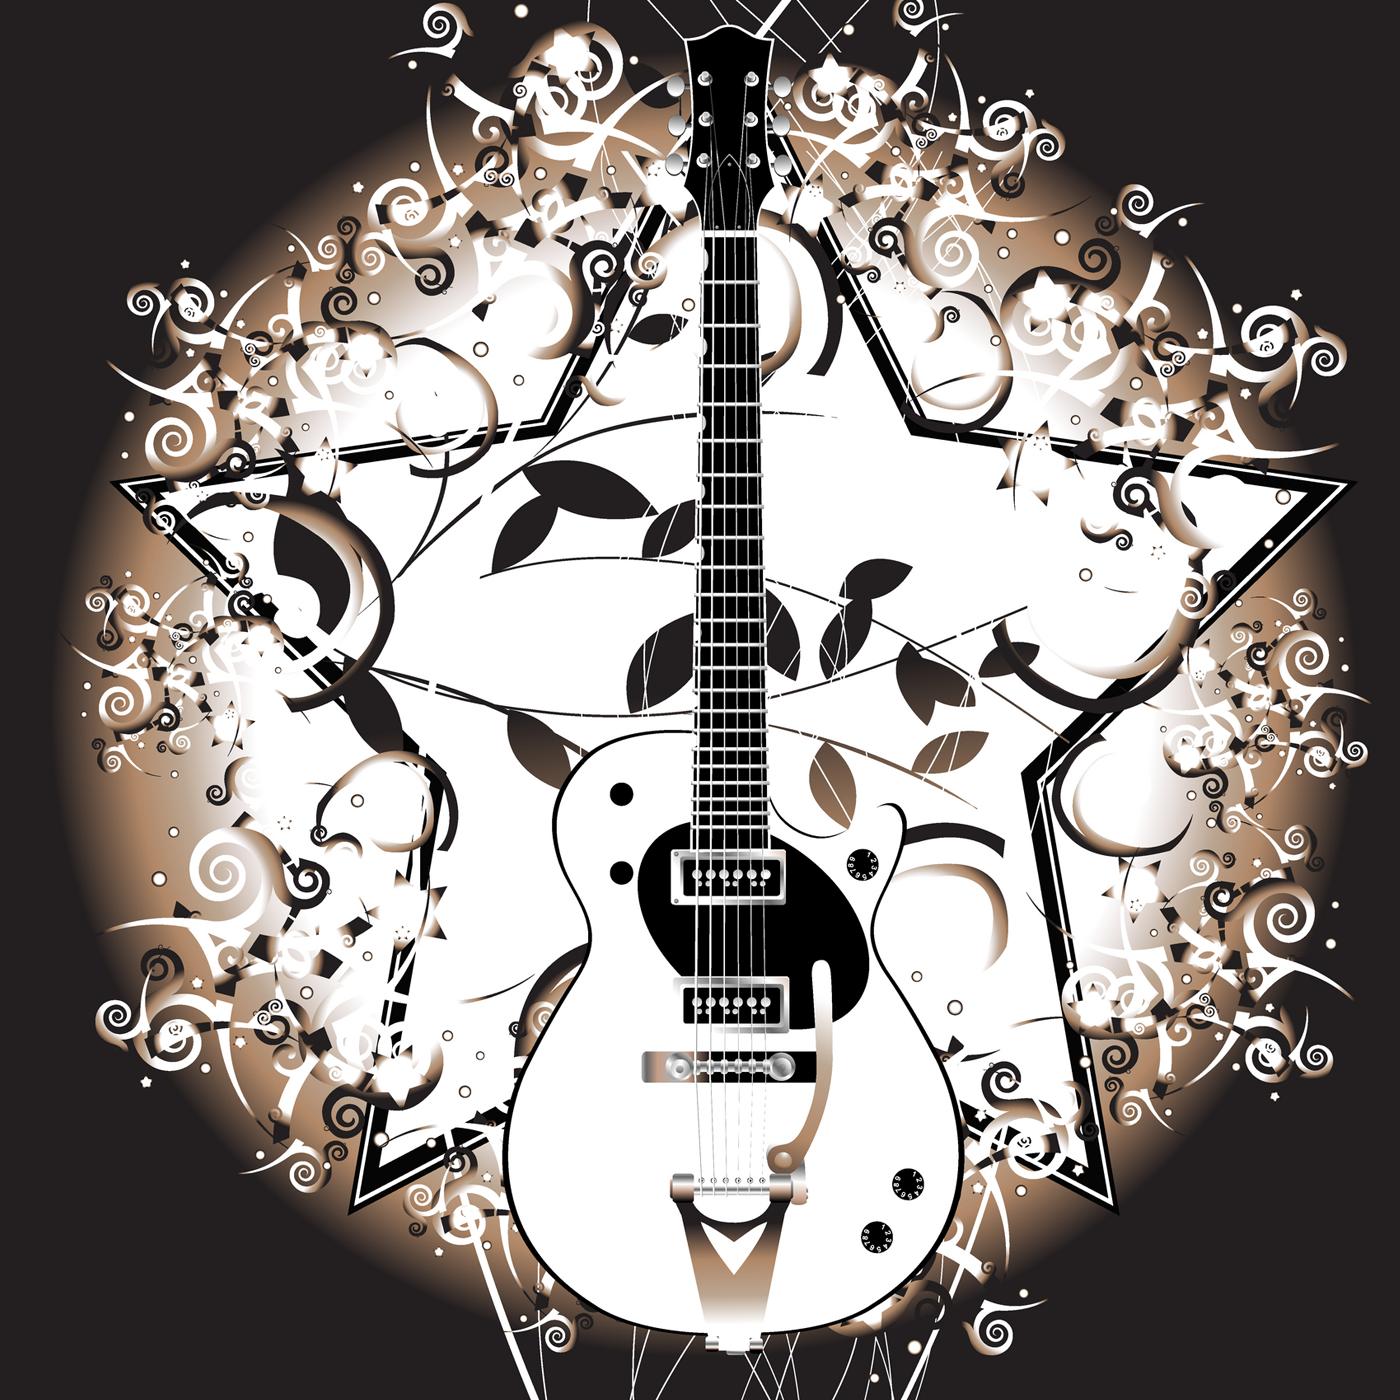 hard rock rockradiocom